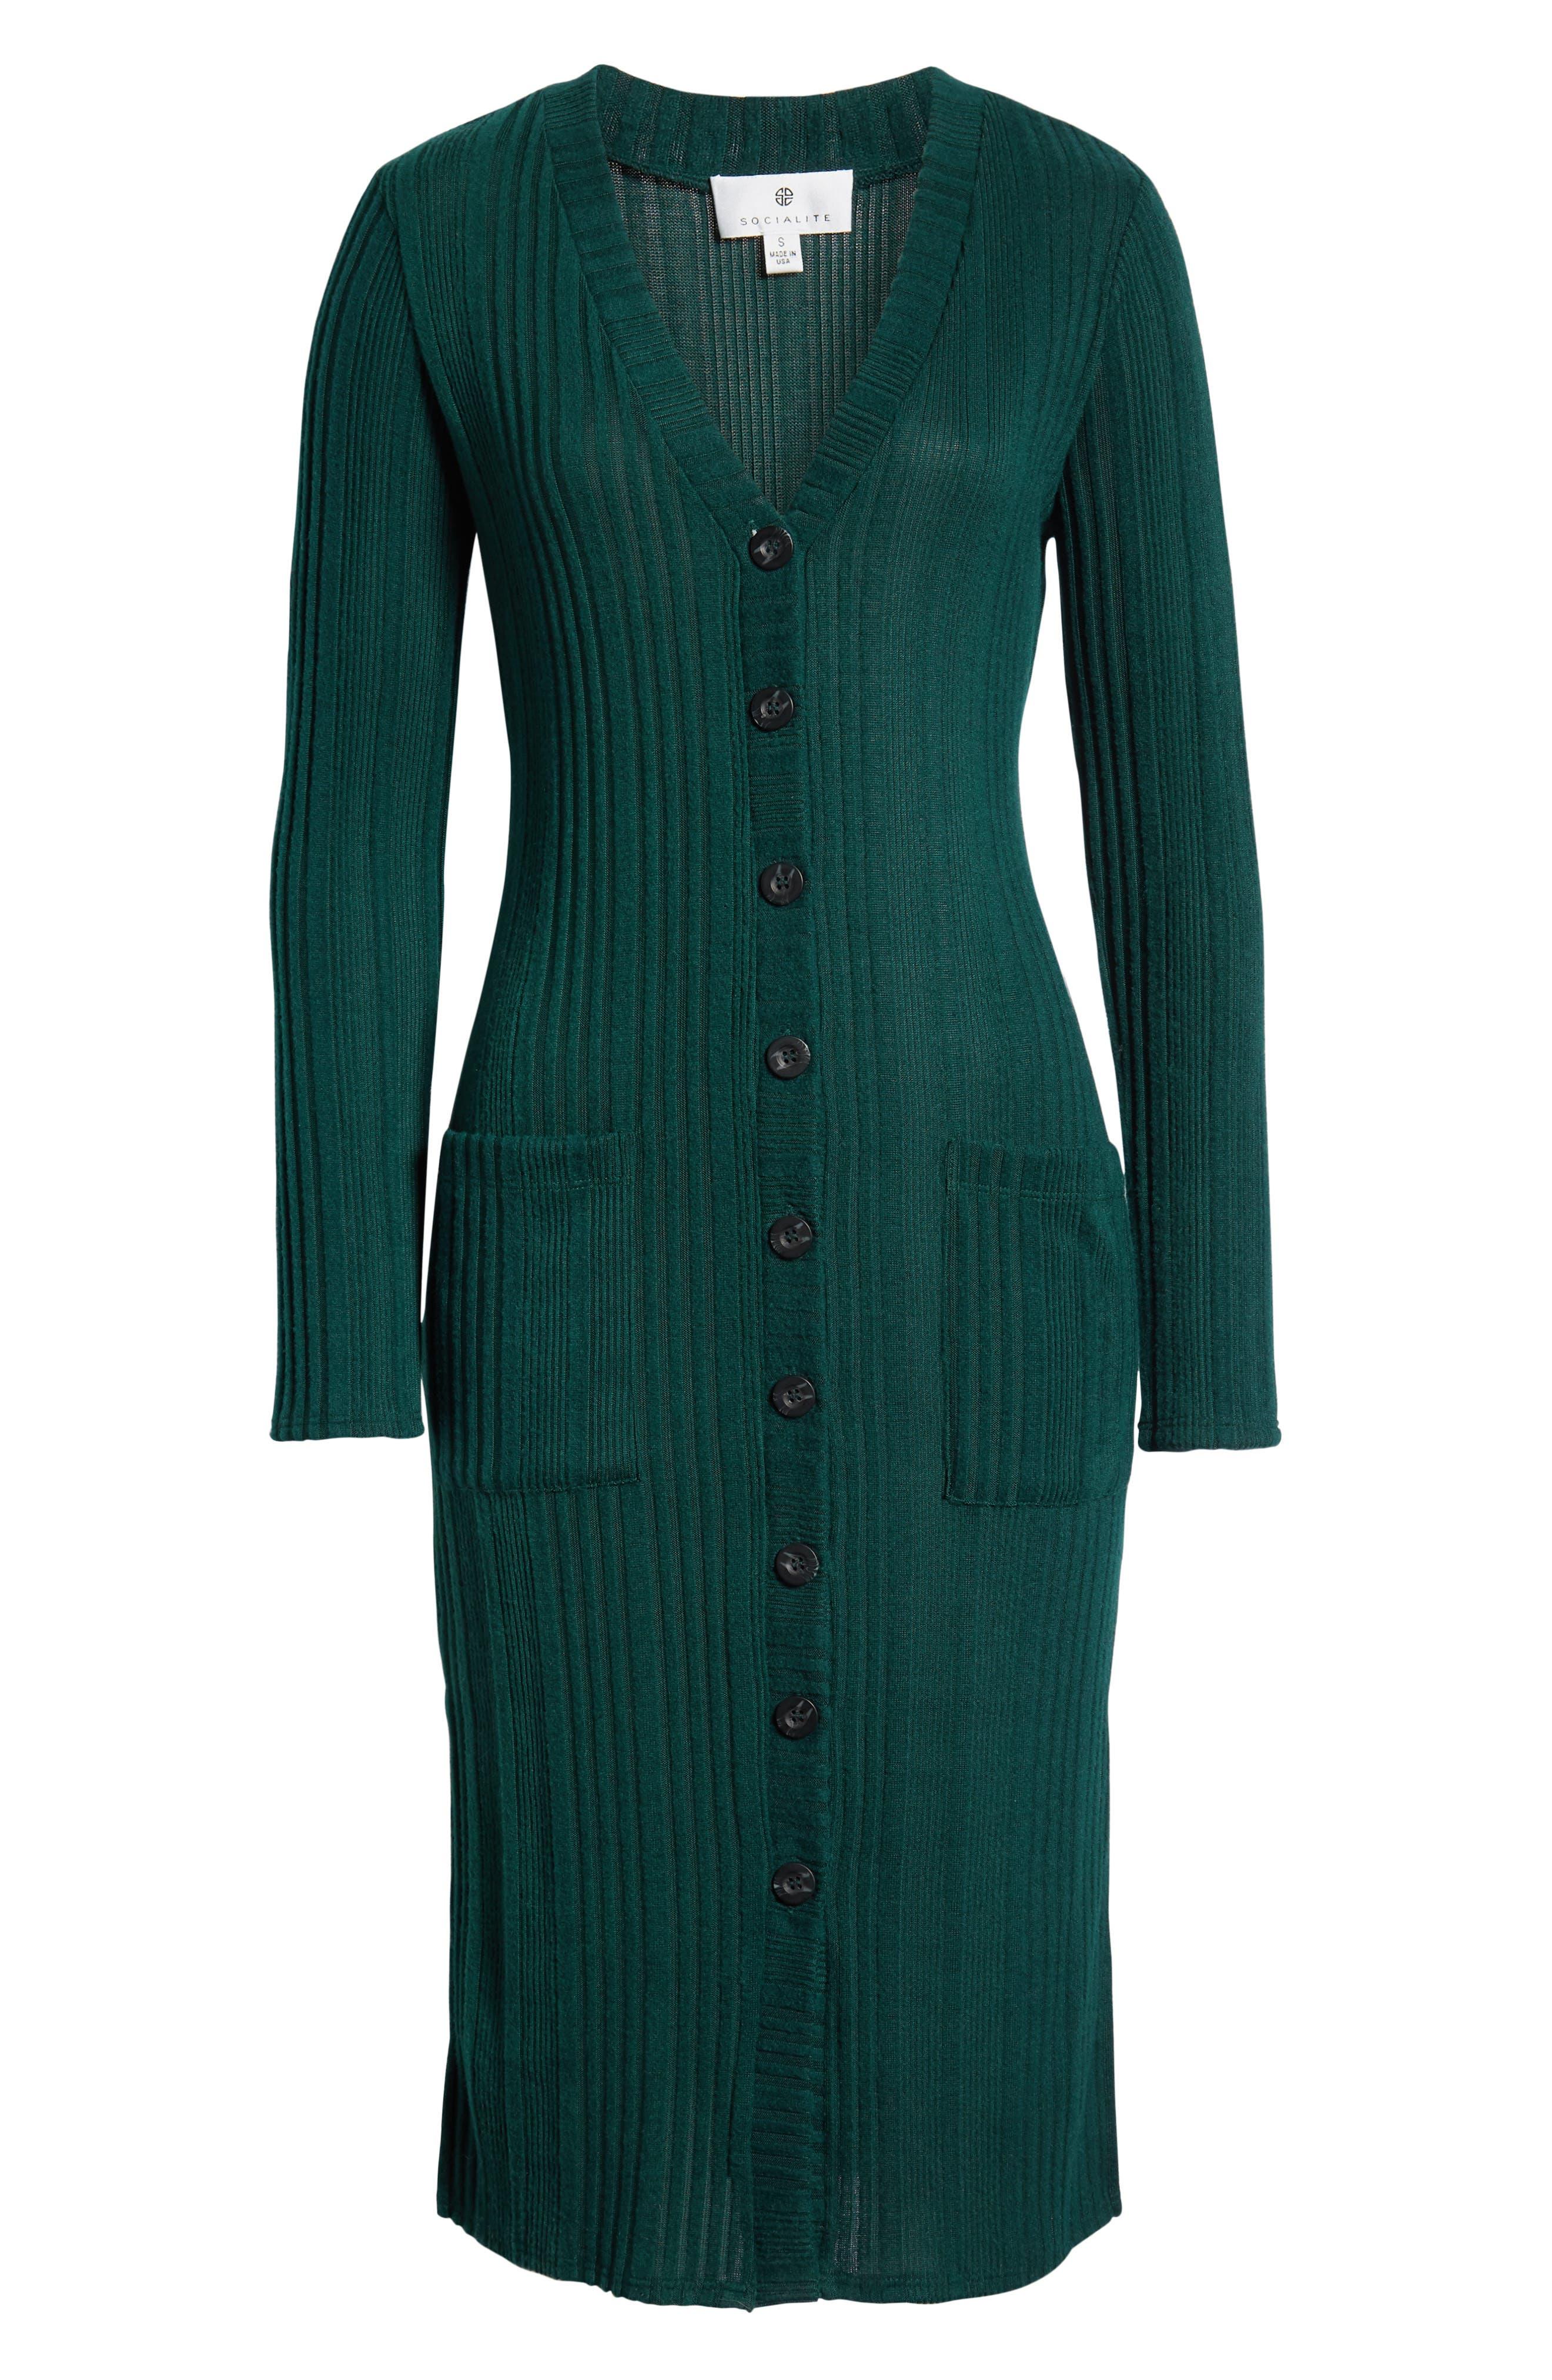 SOCIALITE,                             Sweater Dress,                             Alternate thumbnail 8, color,                             300